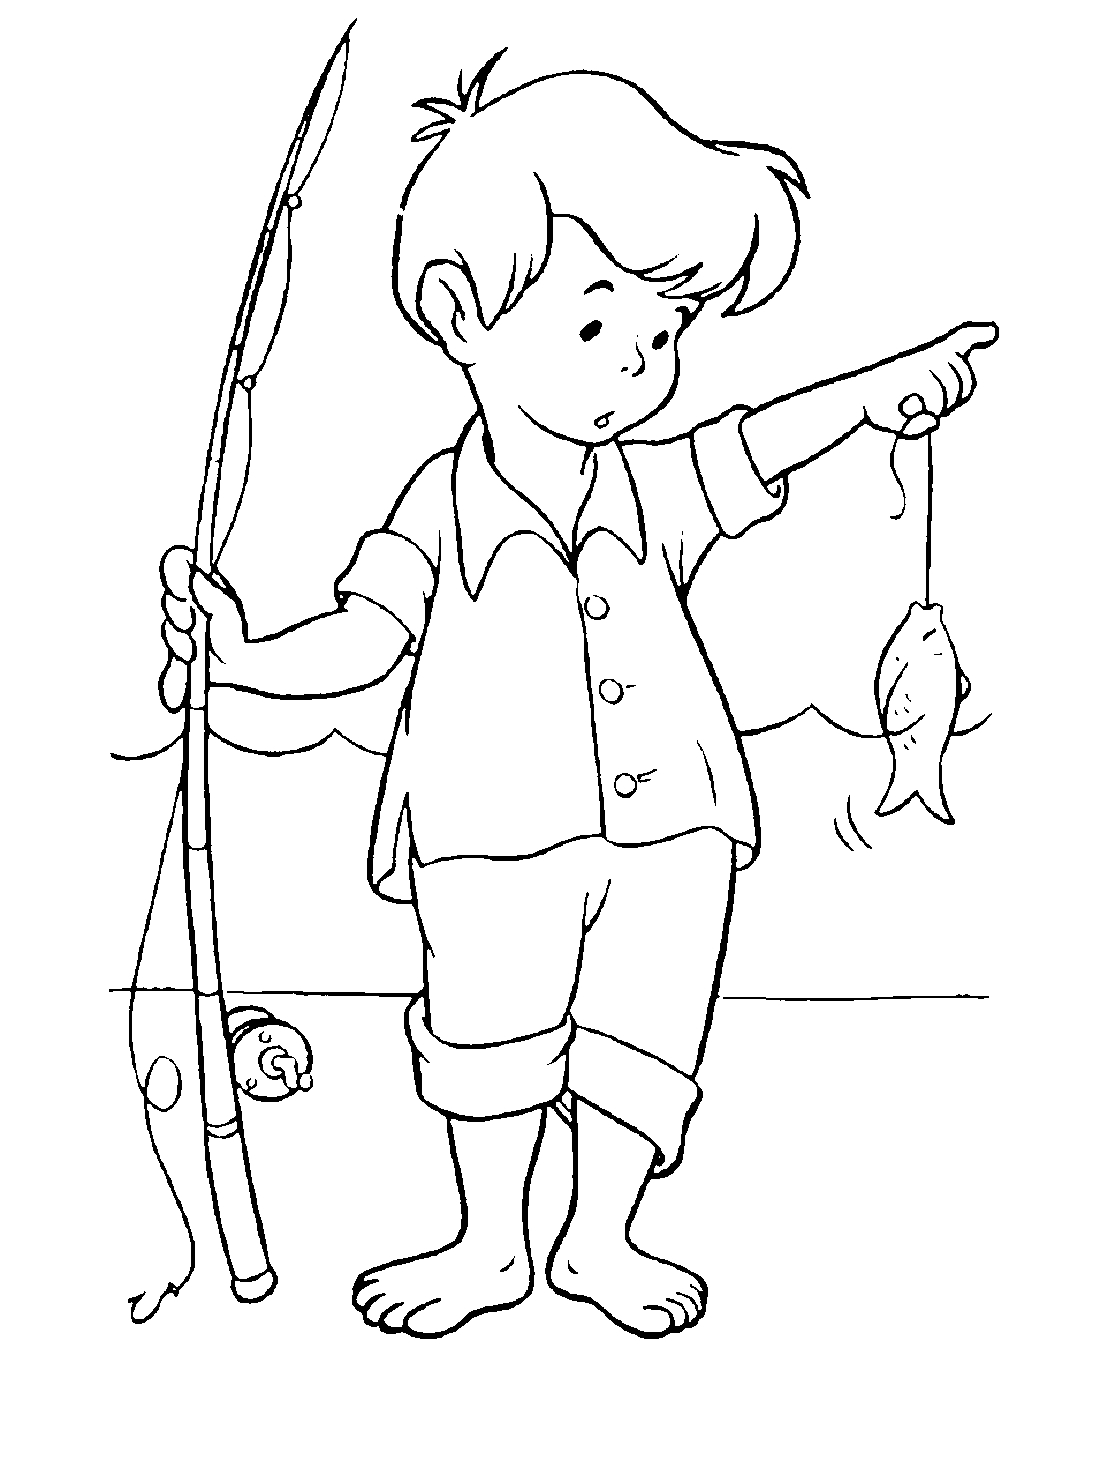 Молодой рыбак - раскраска №3076 | Printonic.ru